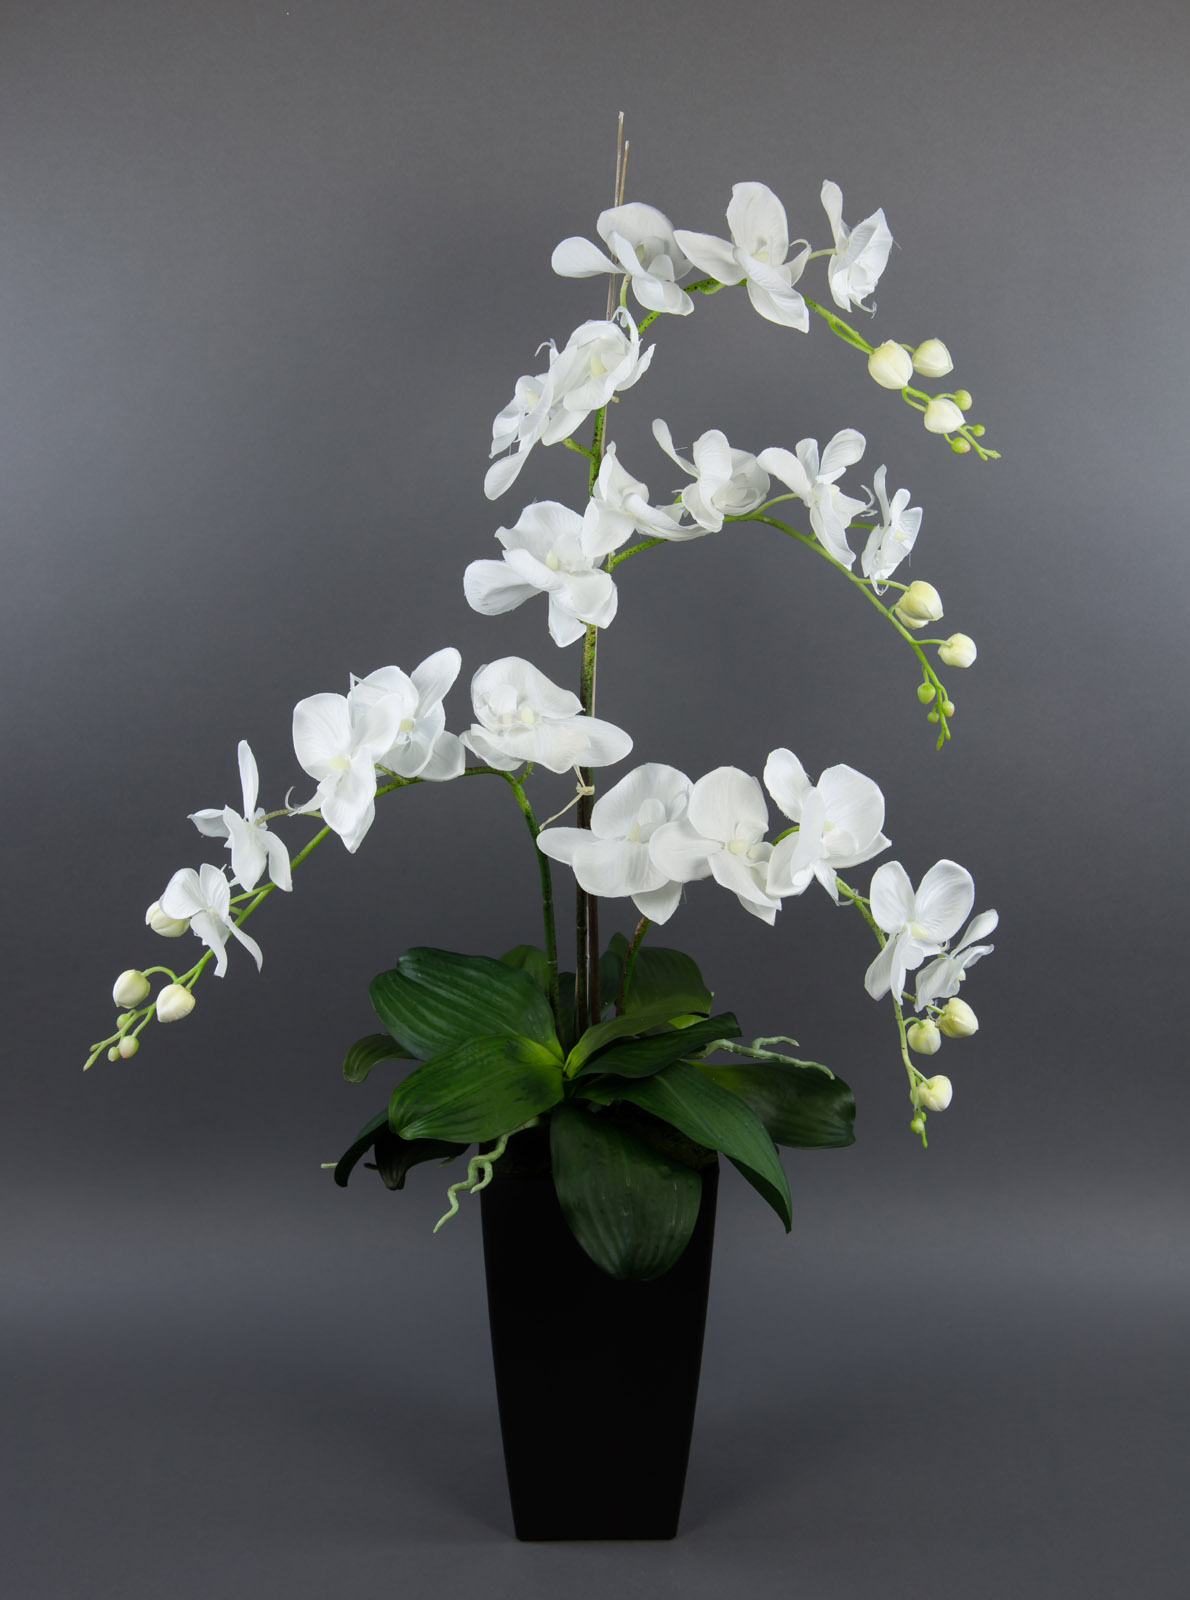 Orchideen arrangement deluxe 80cm wei ad k nstliche orchidee blumen kunstblumen ebay - Orchideen arrangement ...